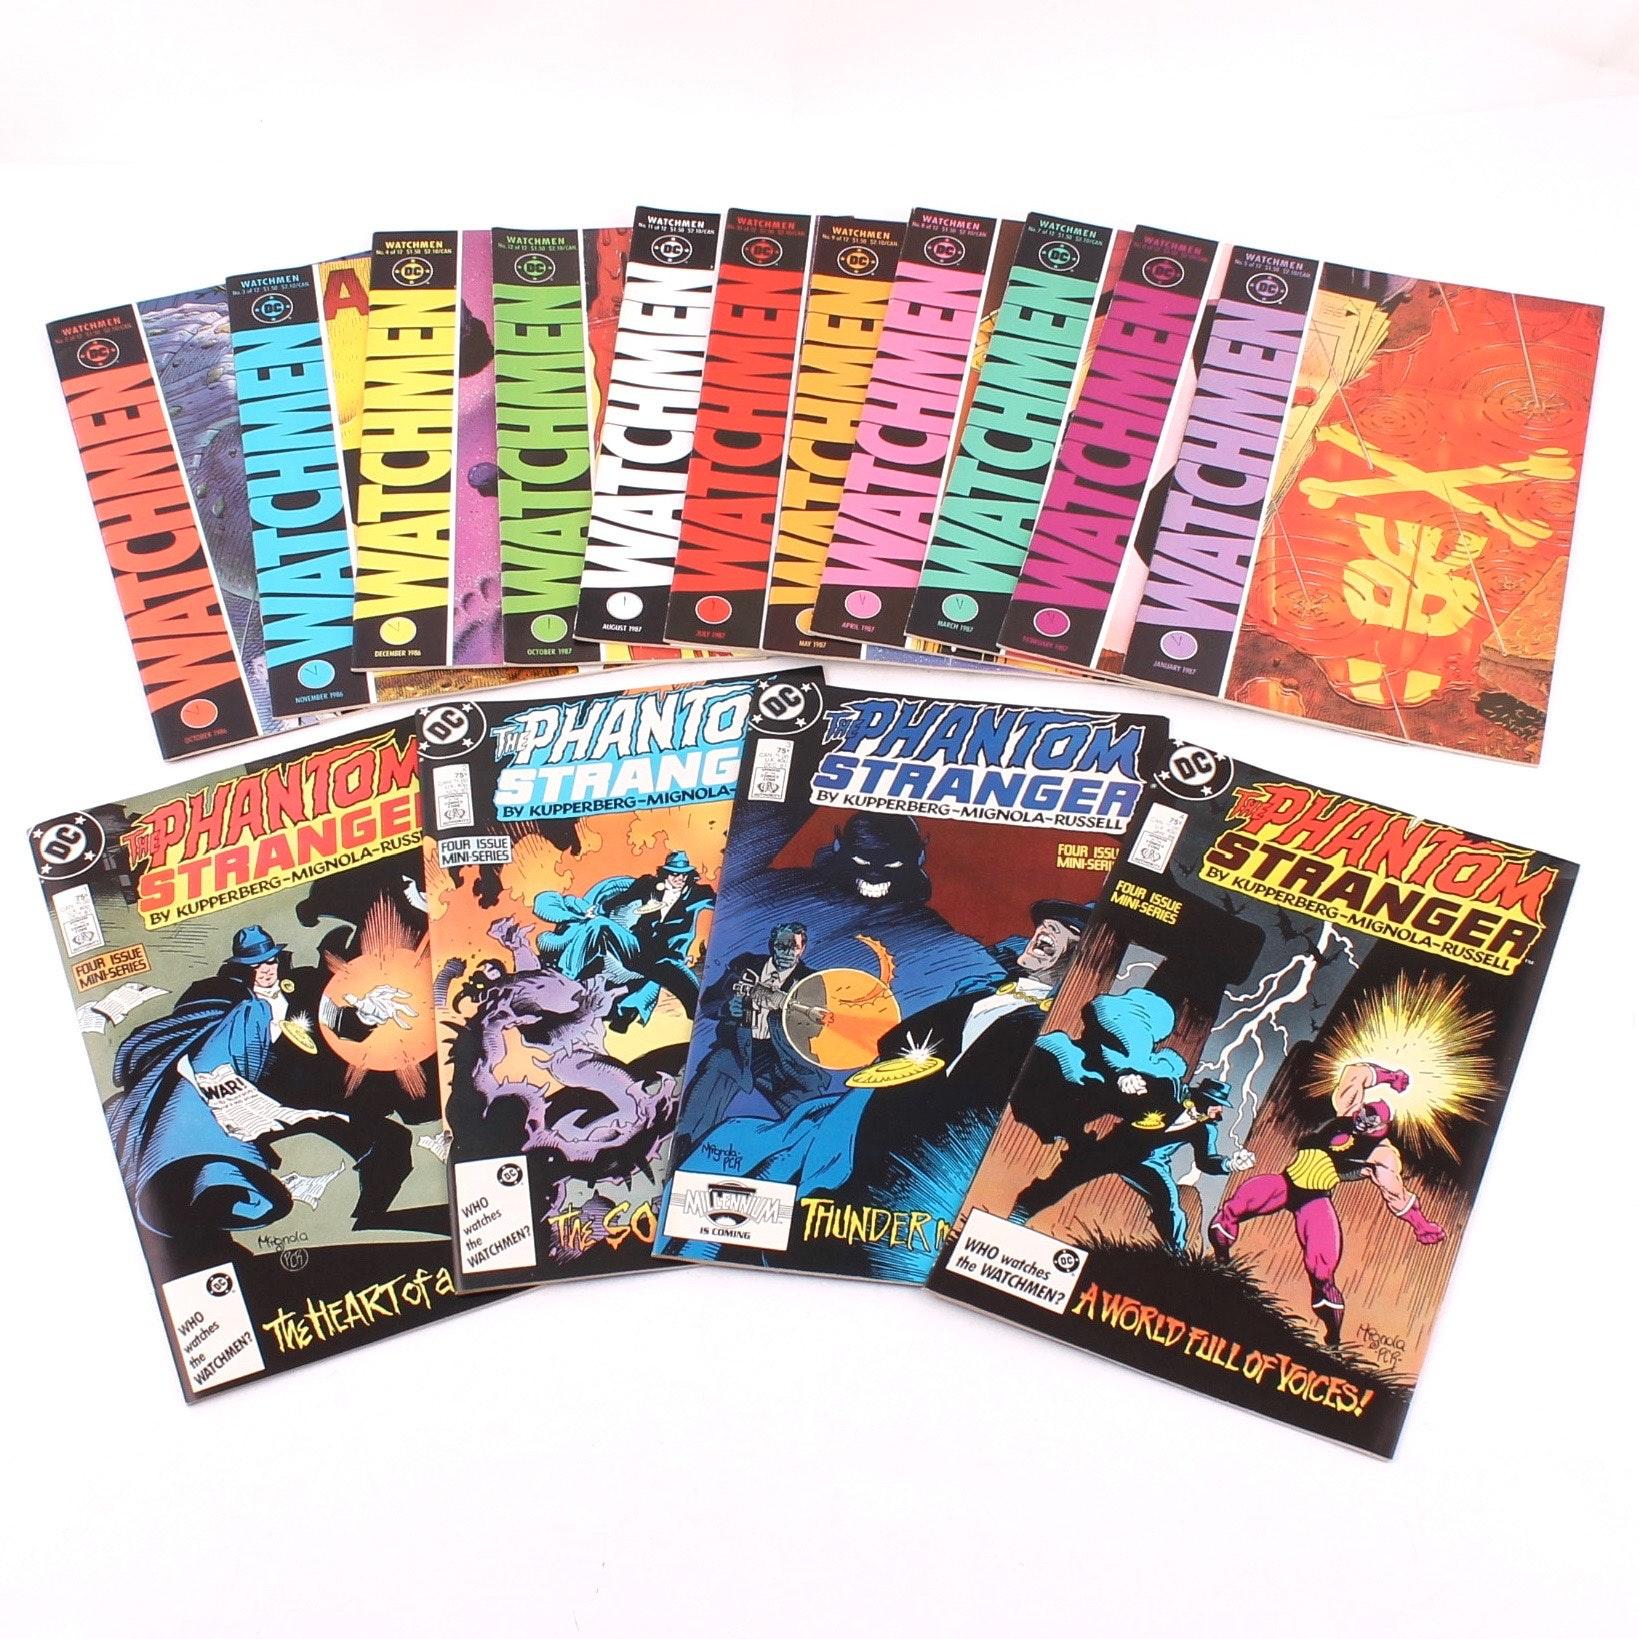 """Watchmen"" and ""Phantom Stranger"" Comic Books"